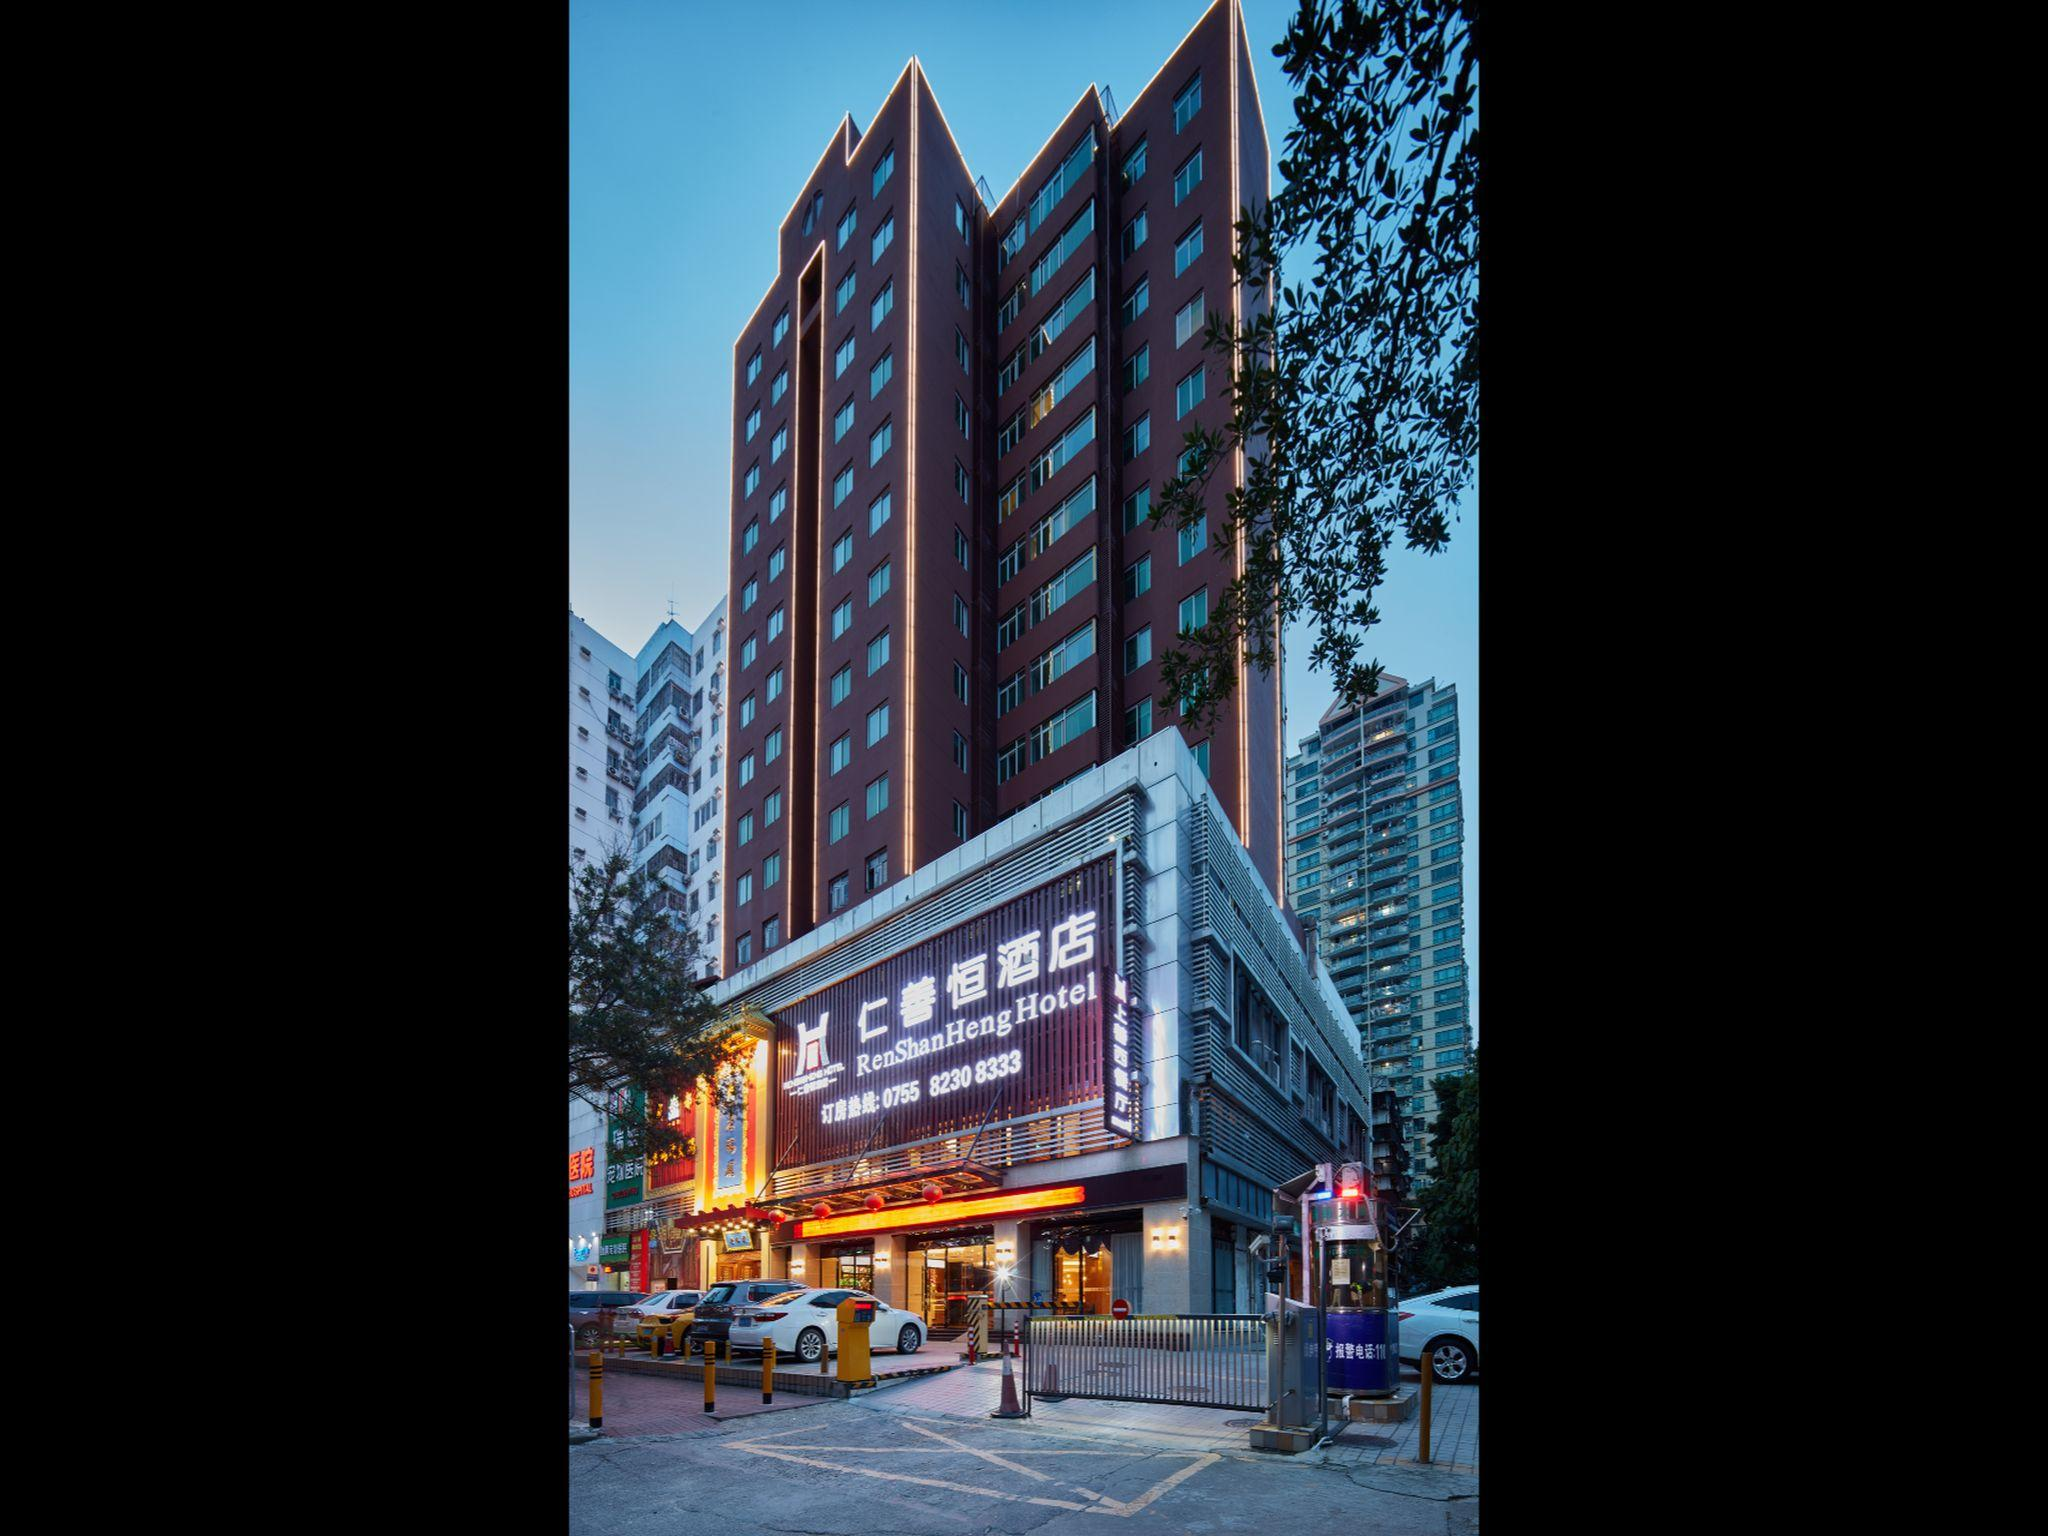 Shenzhen Ren Shan Heng Hotel, North